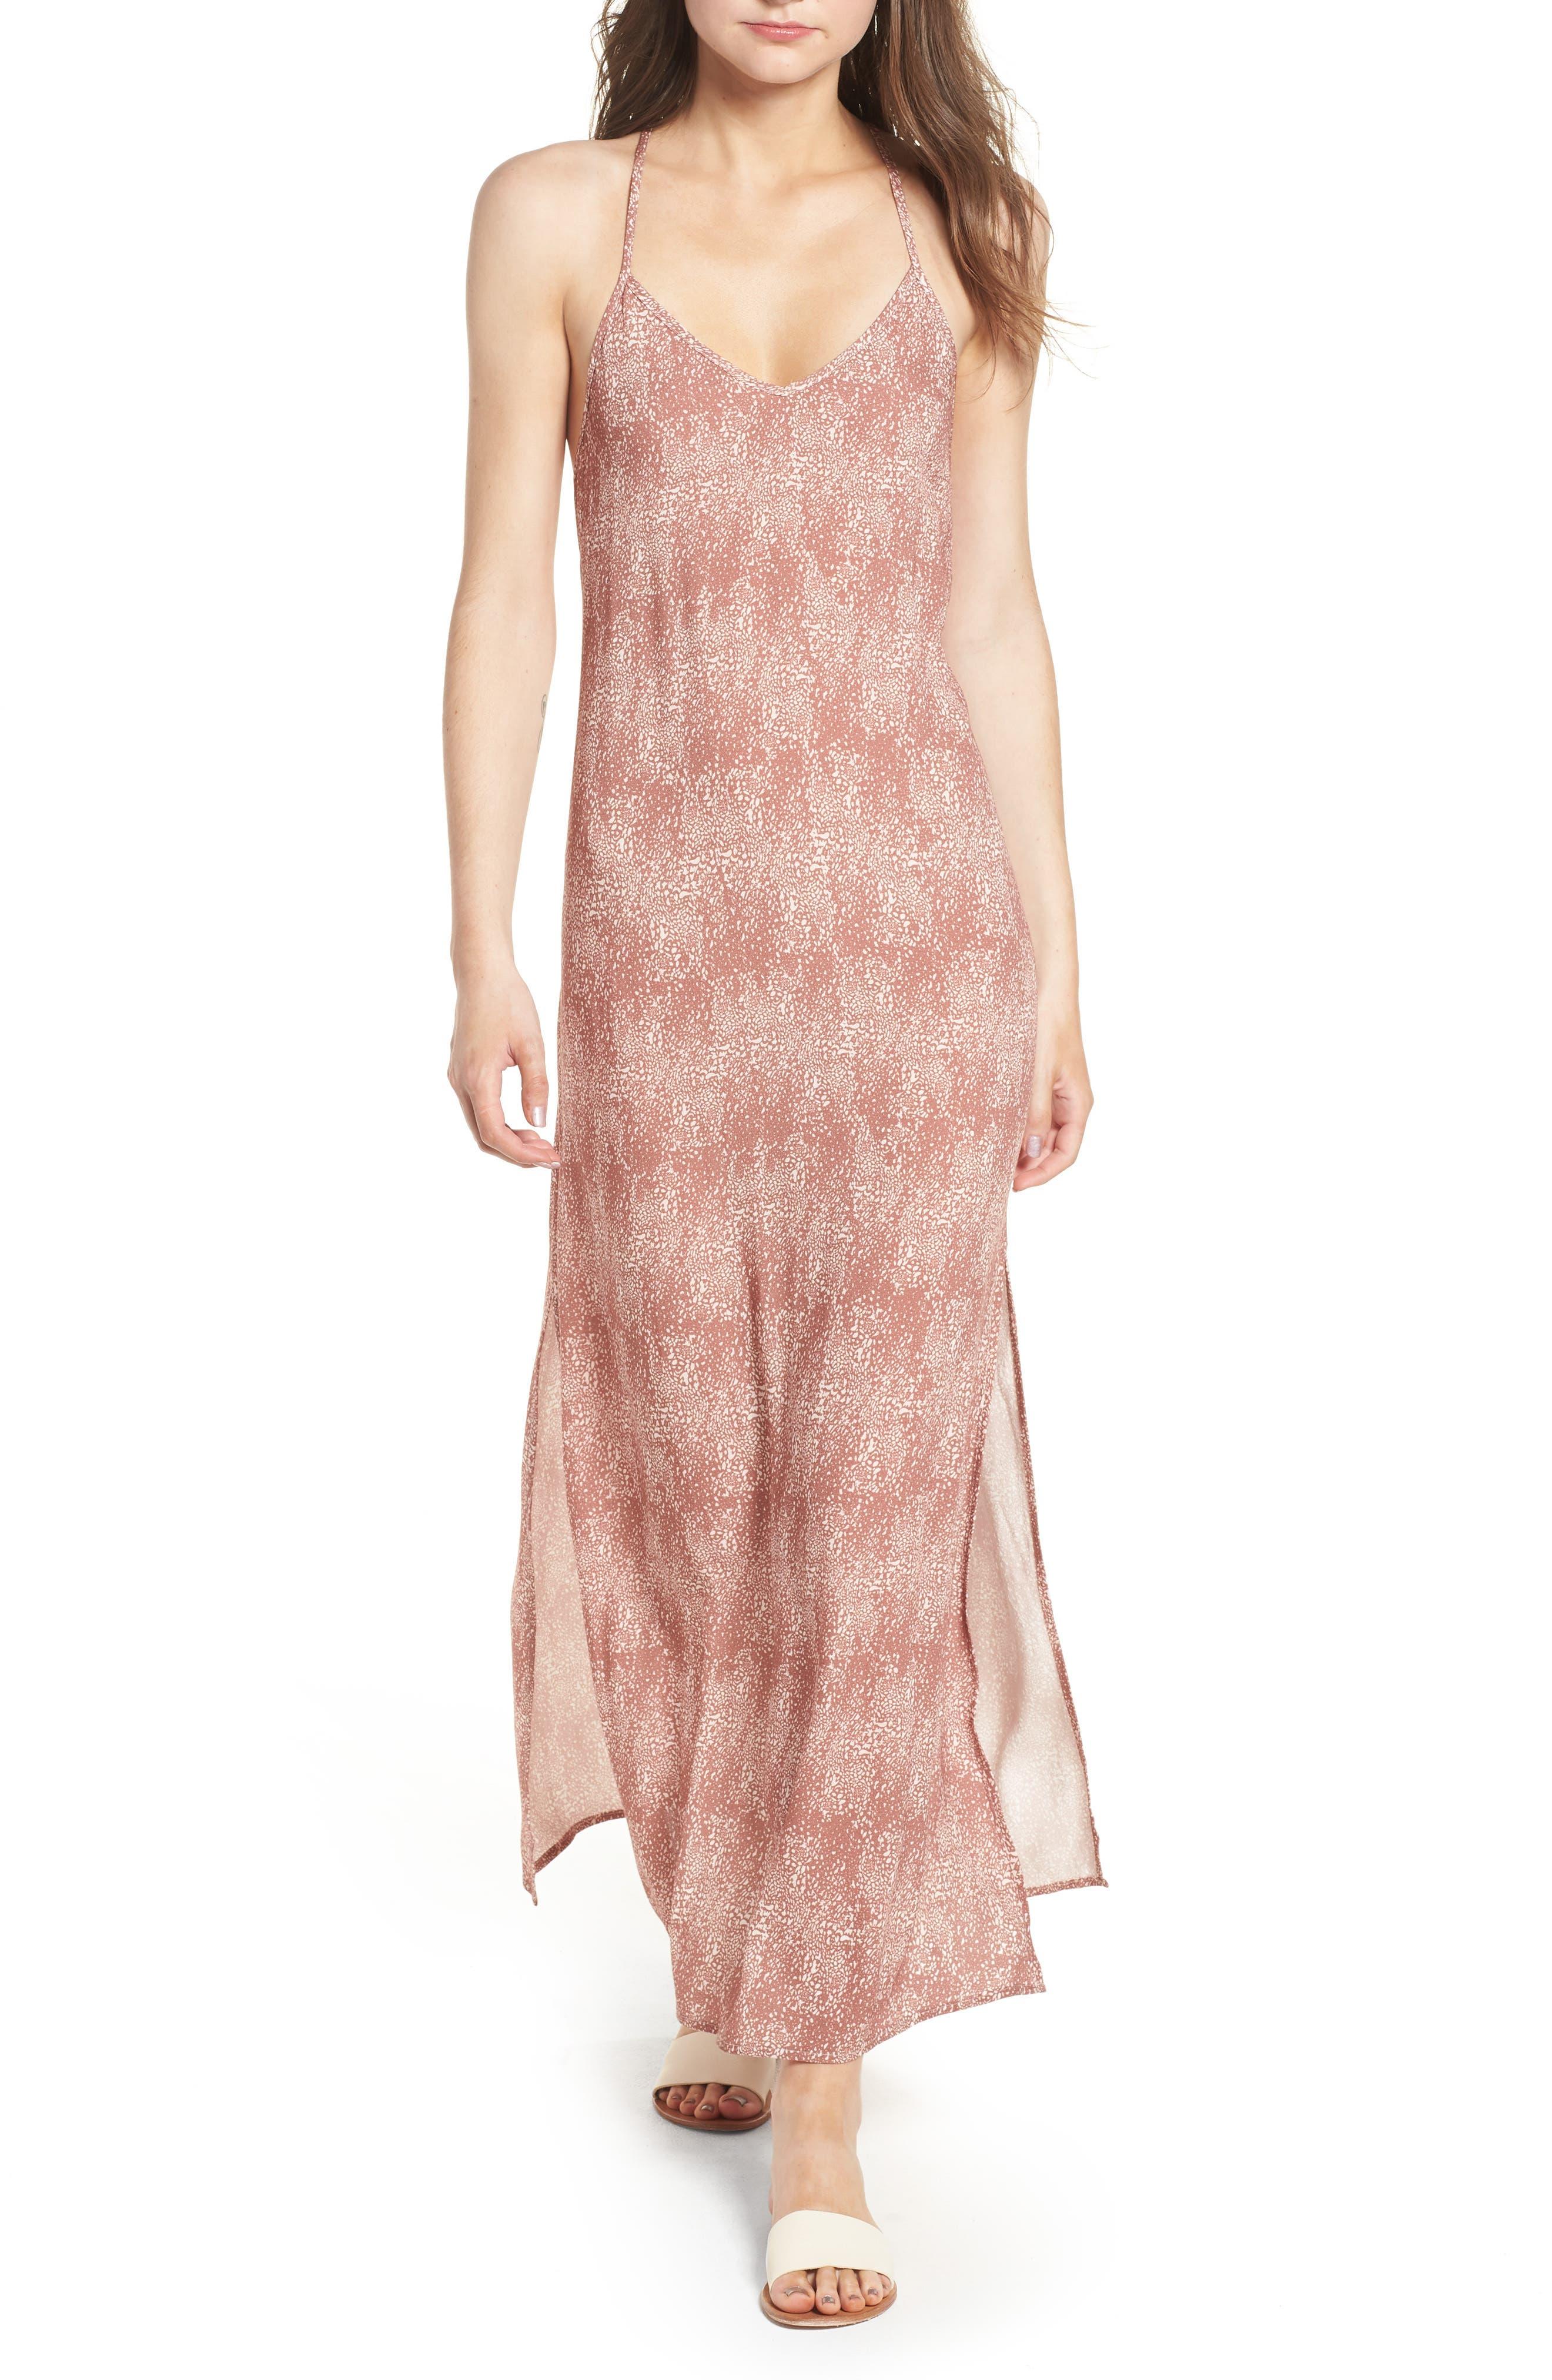 Misty Morning Maxi Dress,                         Main,                         color, Nutmeg